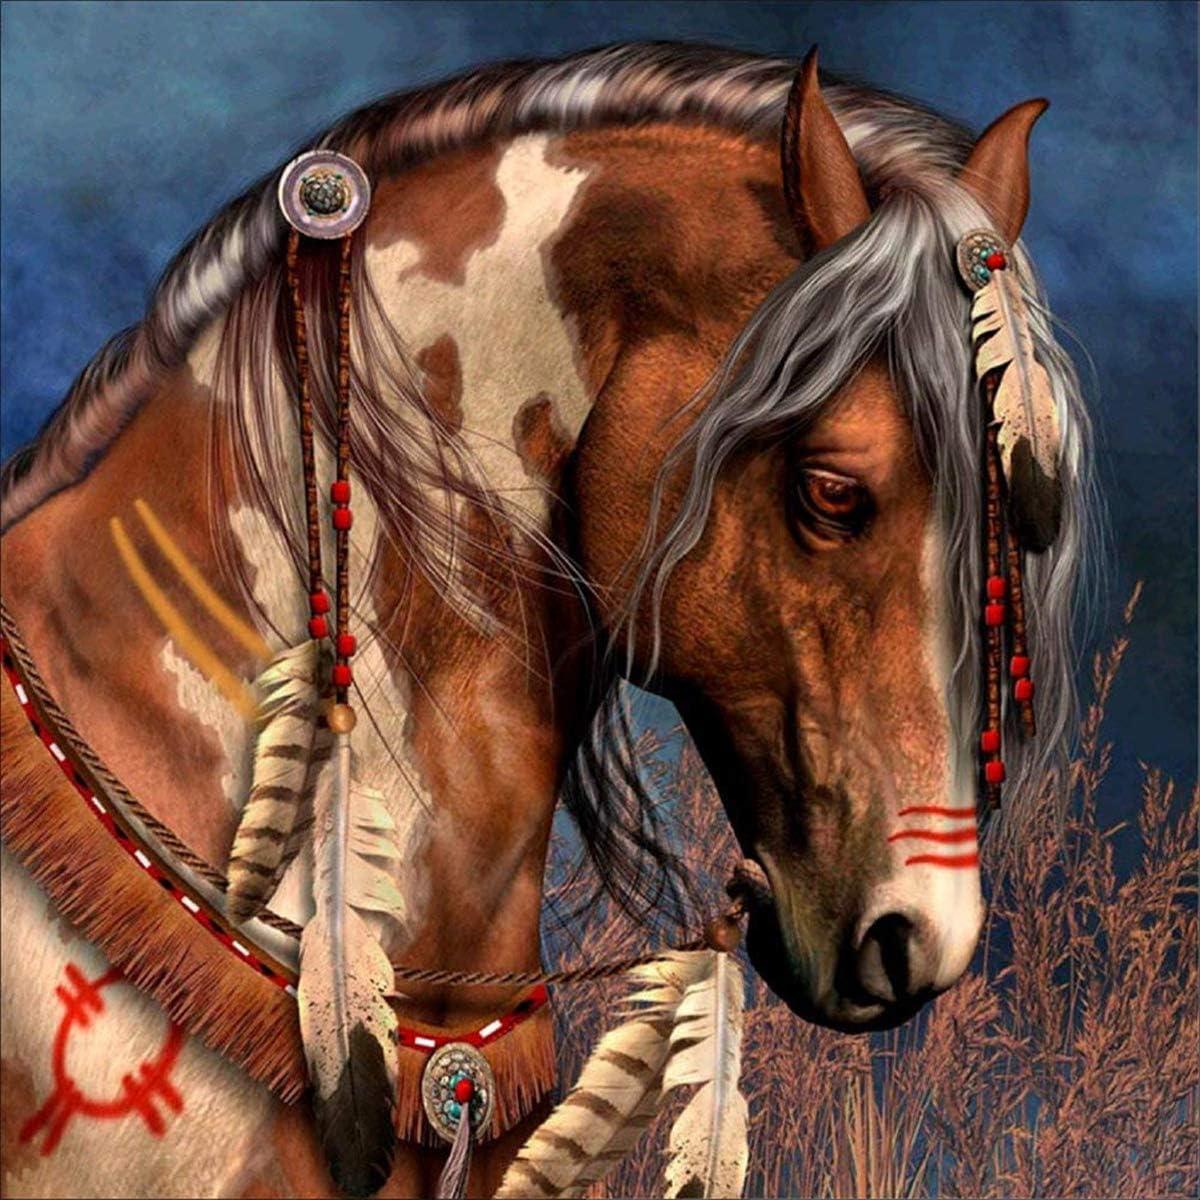 Kit de pintura de diamantes 5D para bricolaje,cuadros punto de Cruz,Diy 5d diamond painting diseño de caballo marrón con diamantes de imitación, para decoración del hogar, 30 x 30 cm